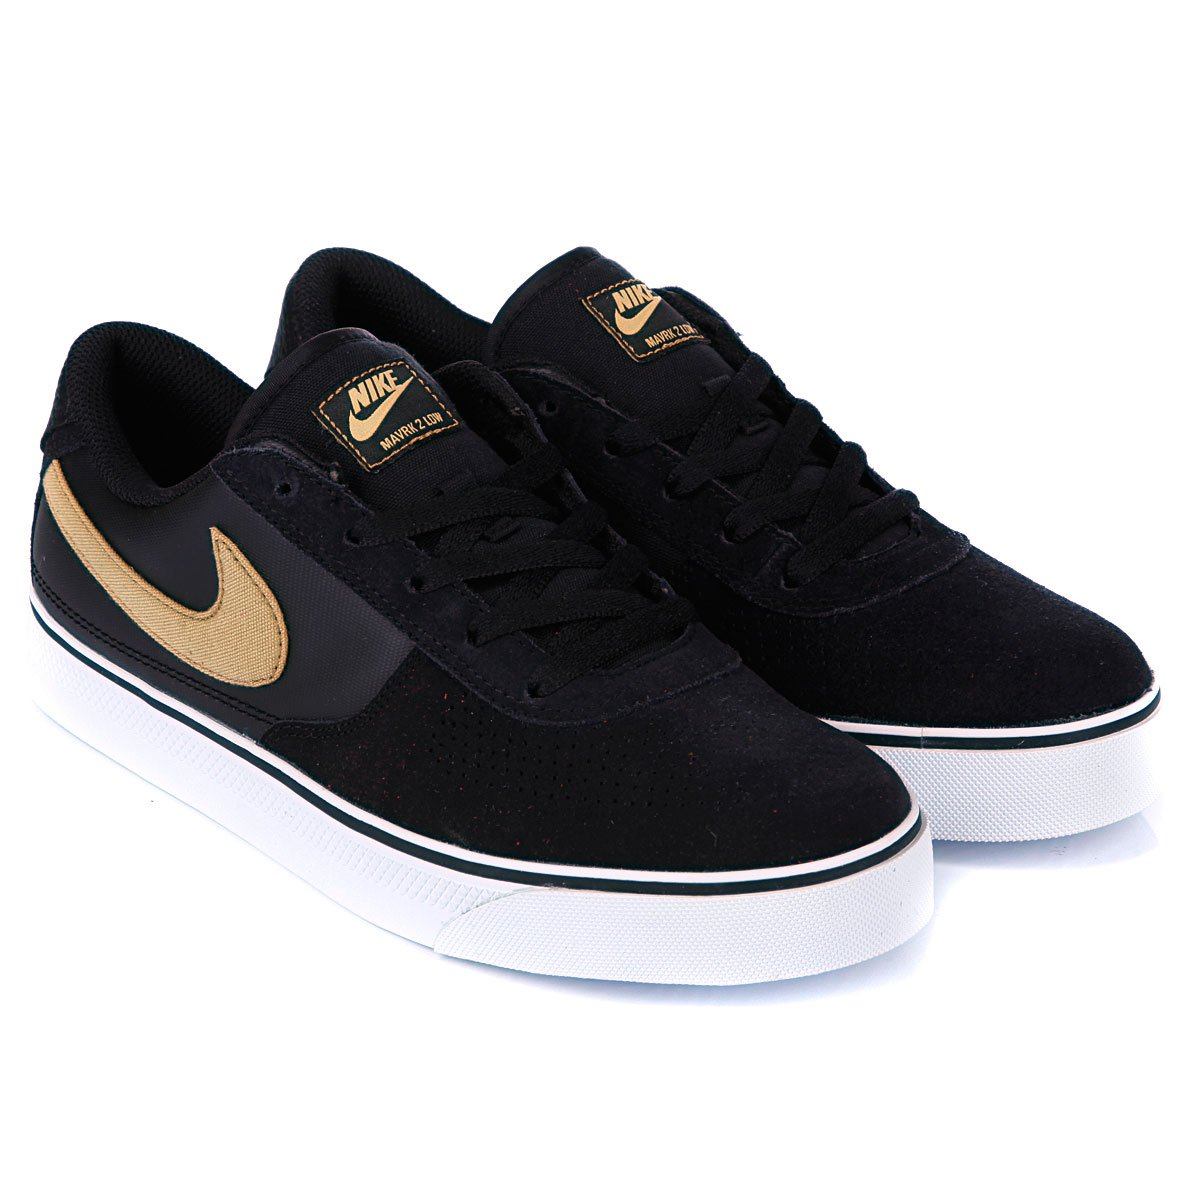 fb98e6d171fe Купить кеды Nike Mavrk Low 2 Black Metallic Gold (442477-071) в ...